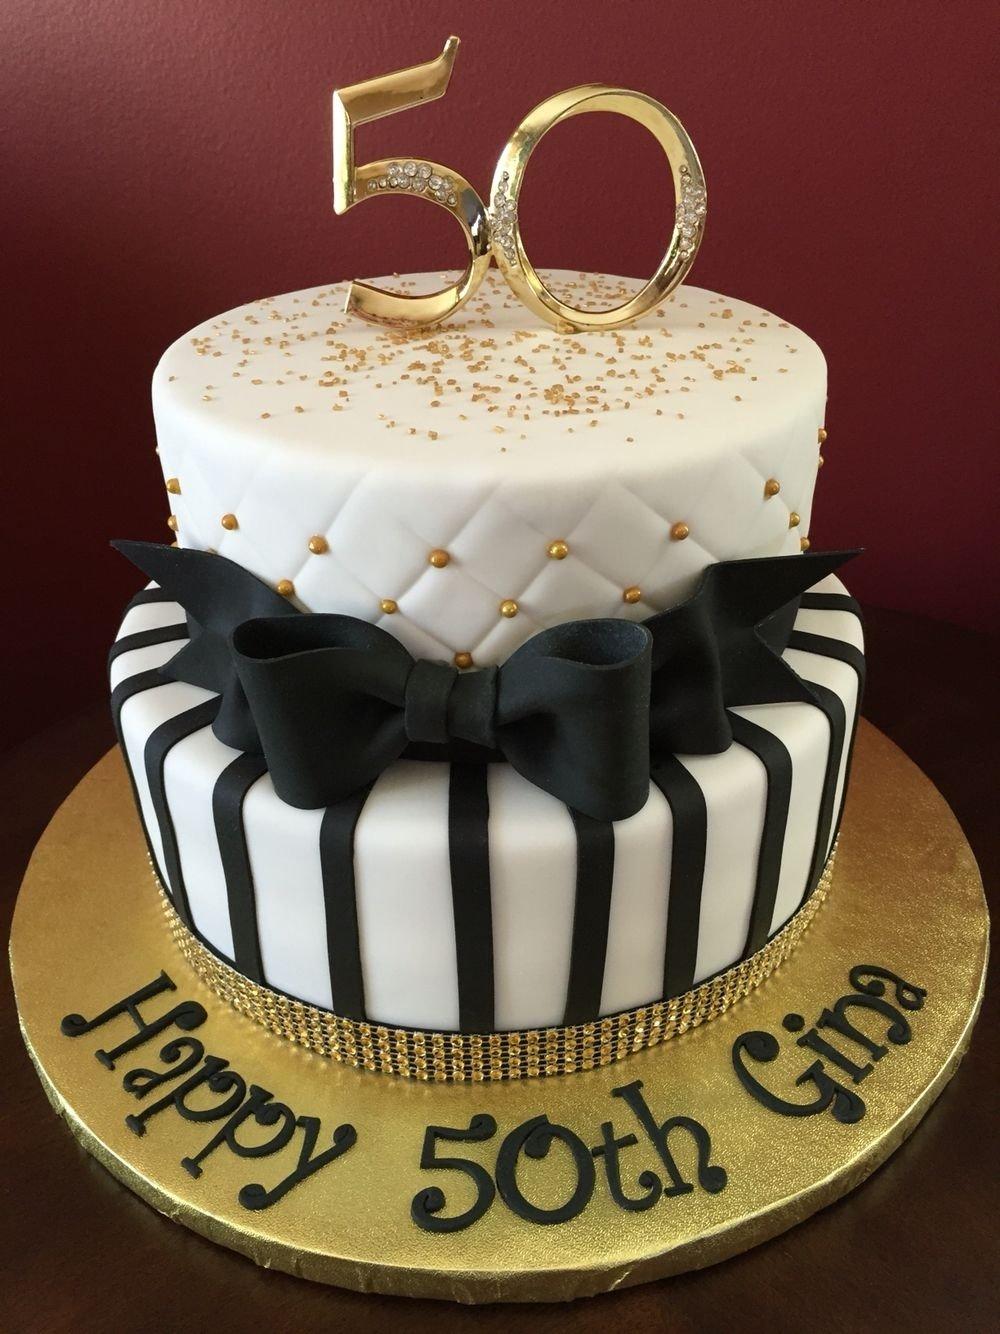 10 Wonderful Ideas For 50Th Birthday Cake black and gold 50th birthday cake birthday cakes pinterest 1 2020